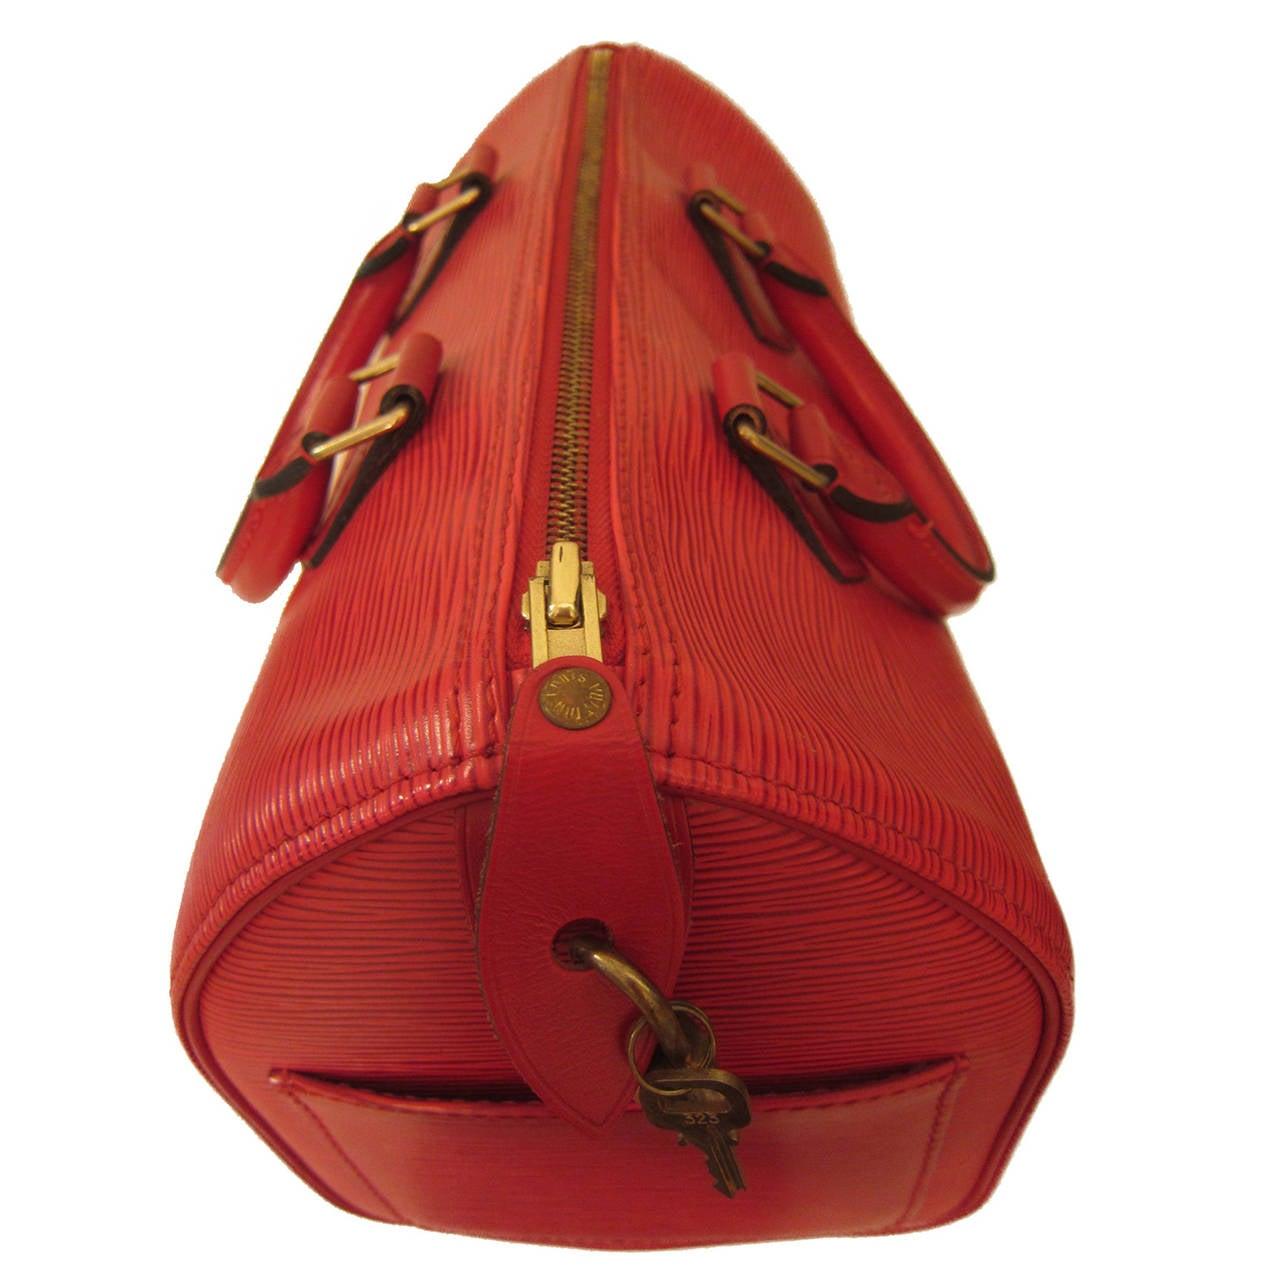 Louis Vuitton Speedy 30 Epi Red In Excellent Condition For Sale In Berlin, DE